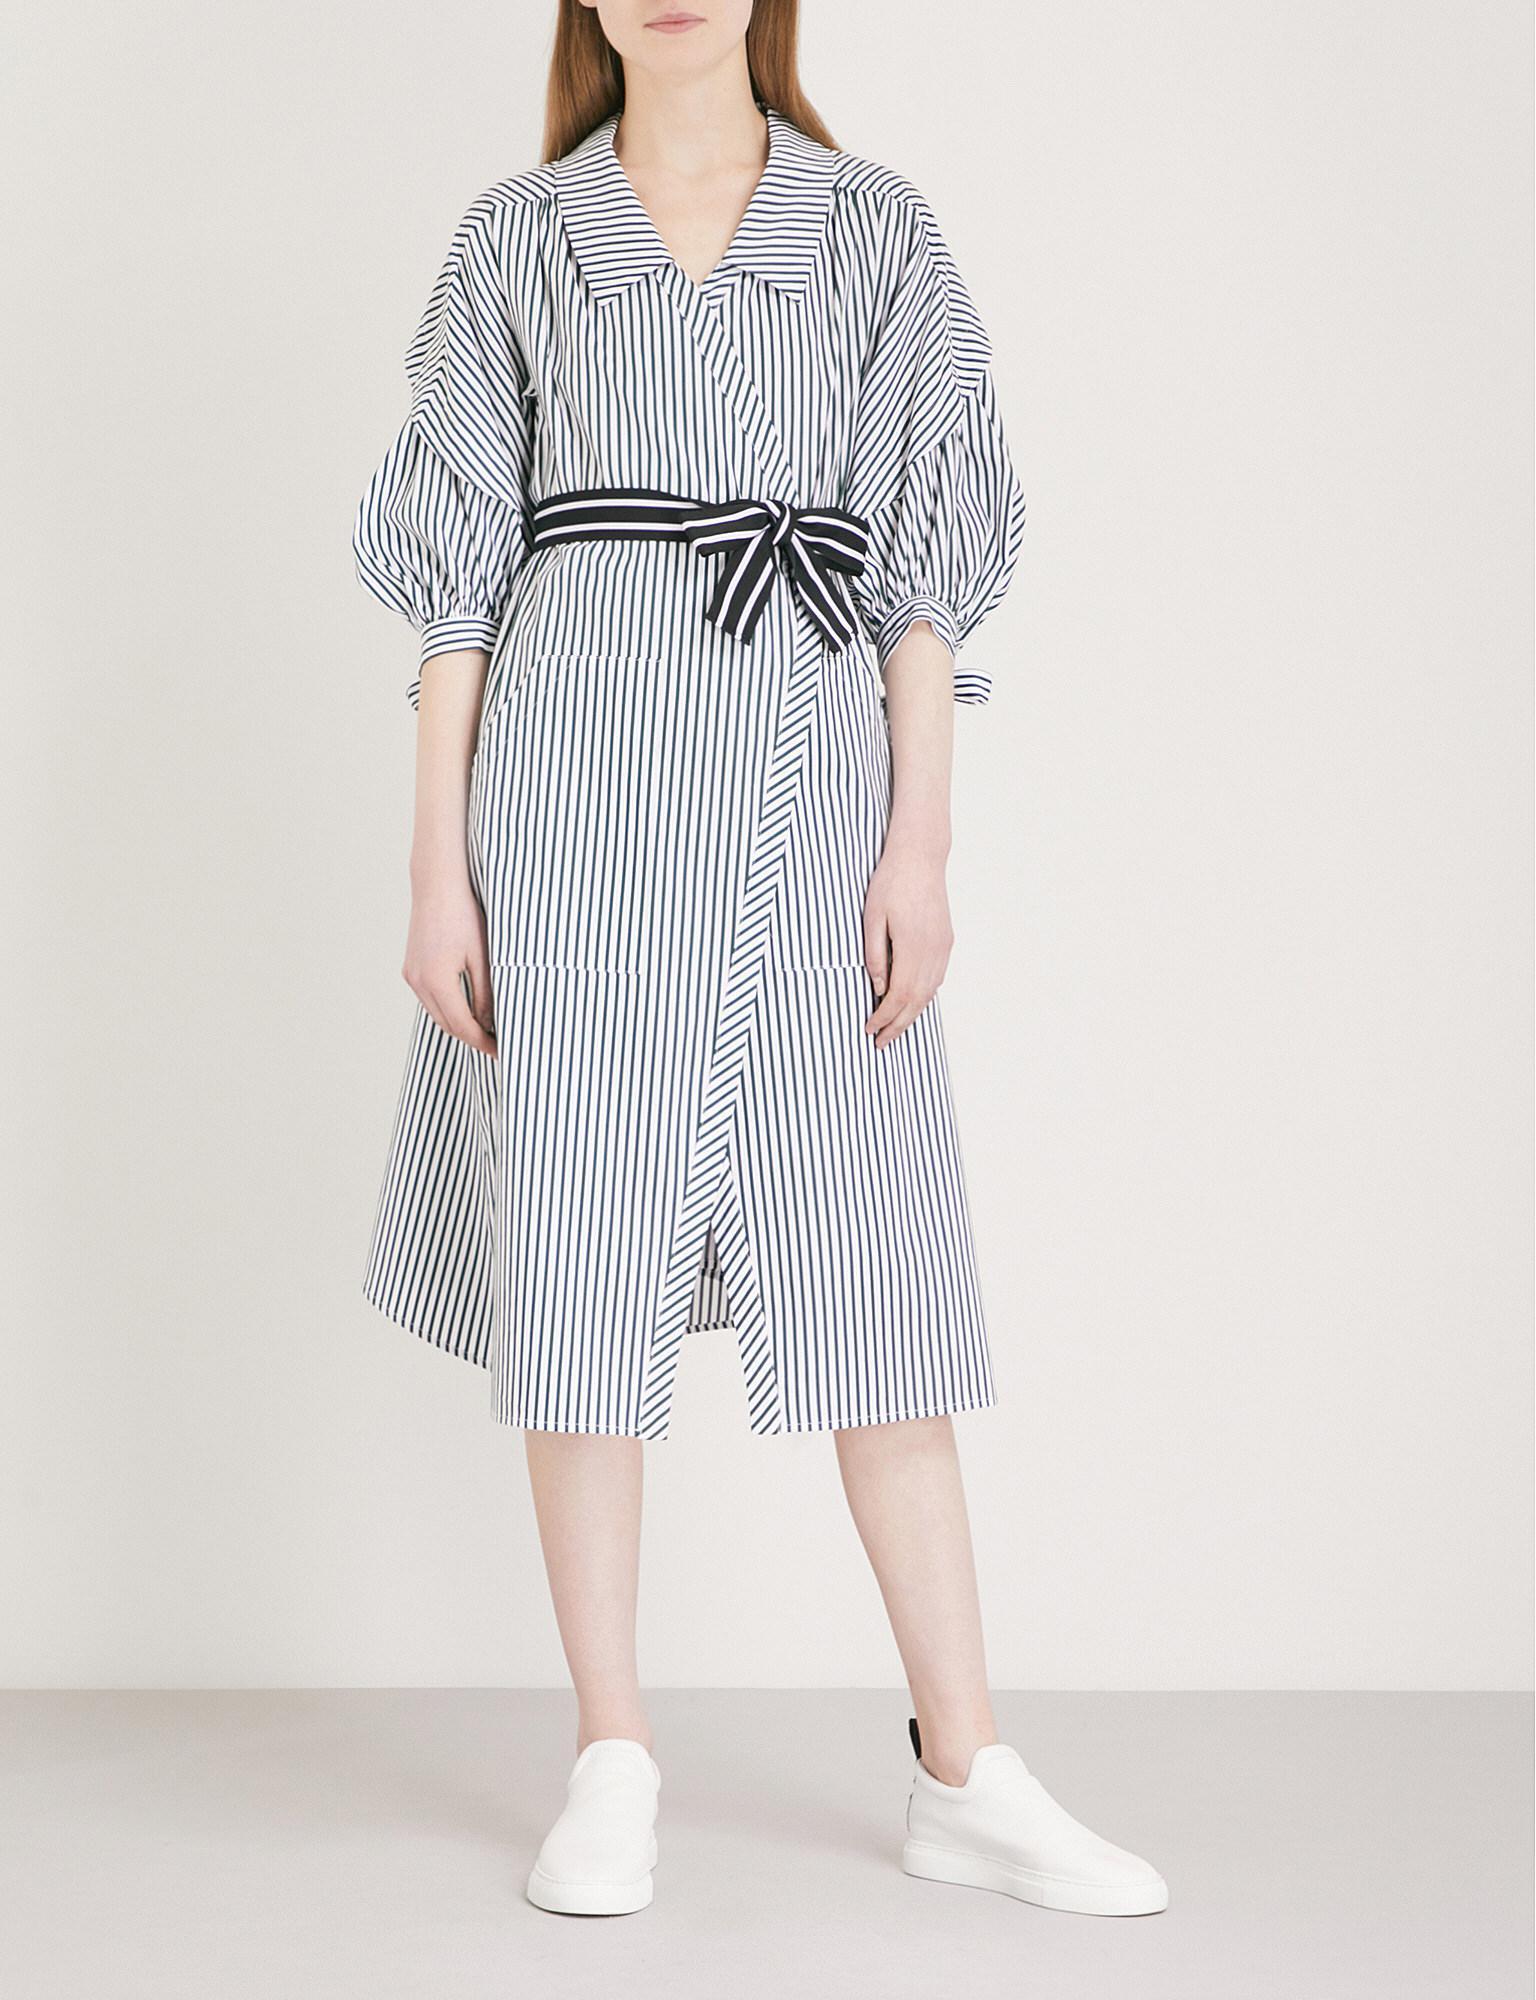 4e8903627f5 Maje Rilucci Striped Cotton Shirt Dress in Blue - Lyst